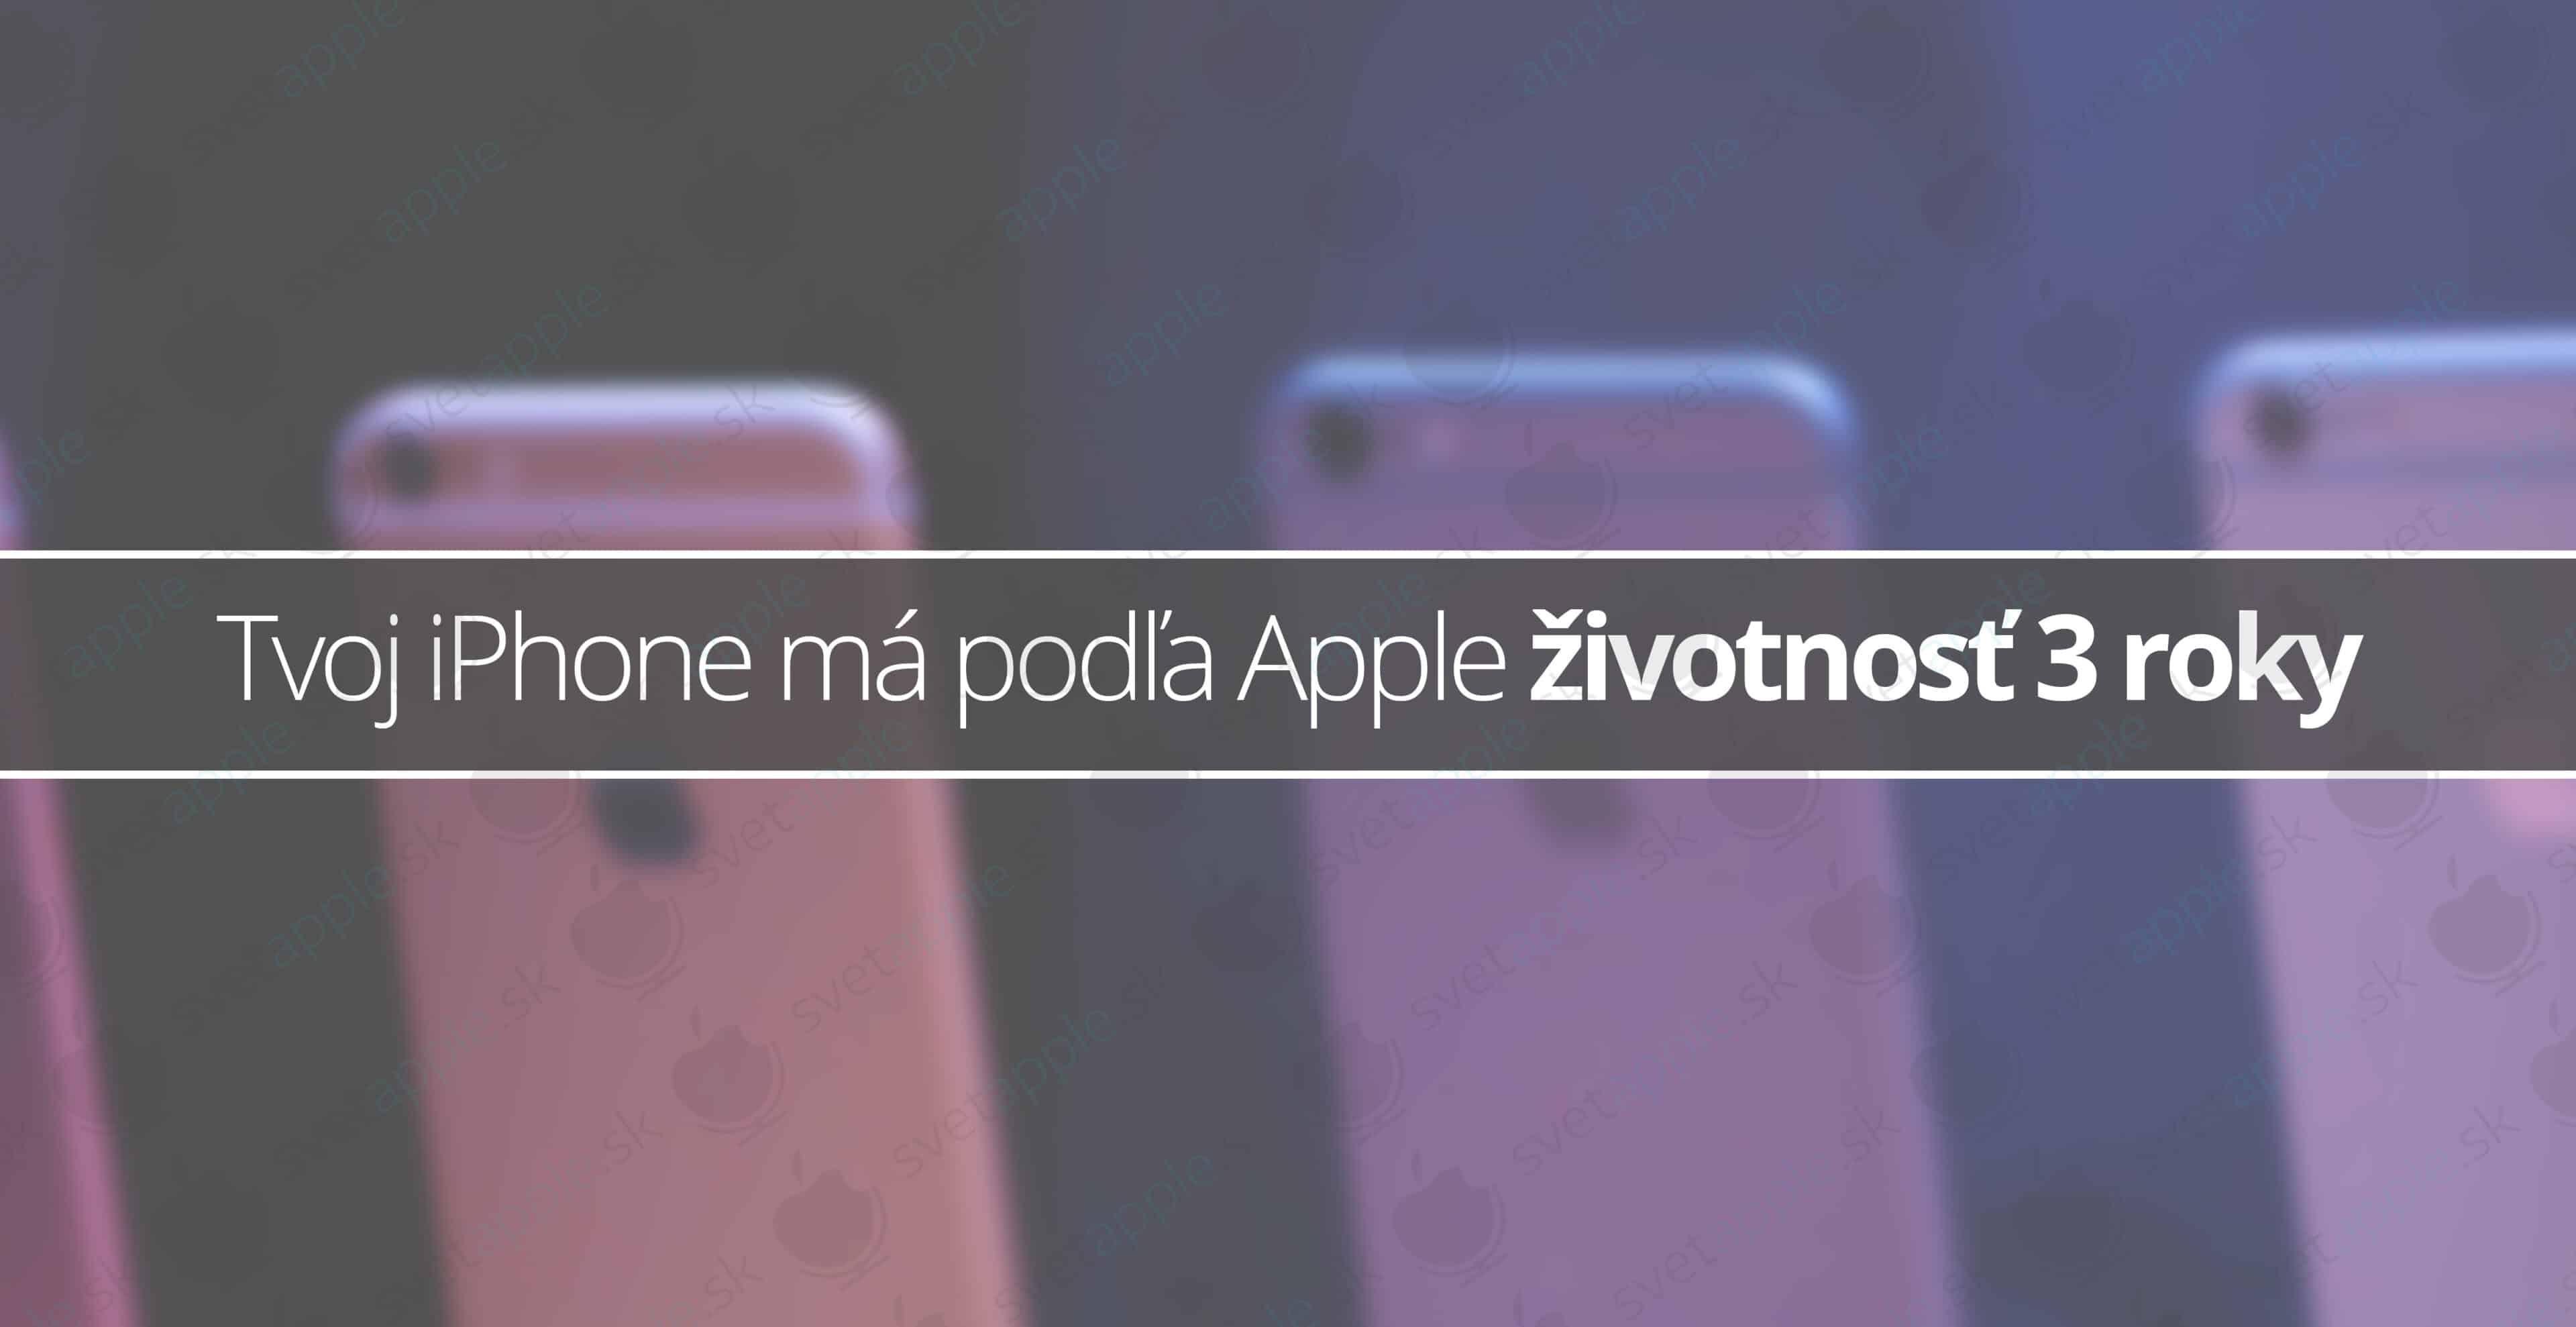 zivotnost-iphone---titulná-fotografia---SvetApple